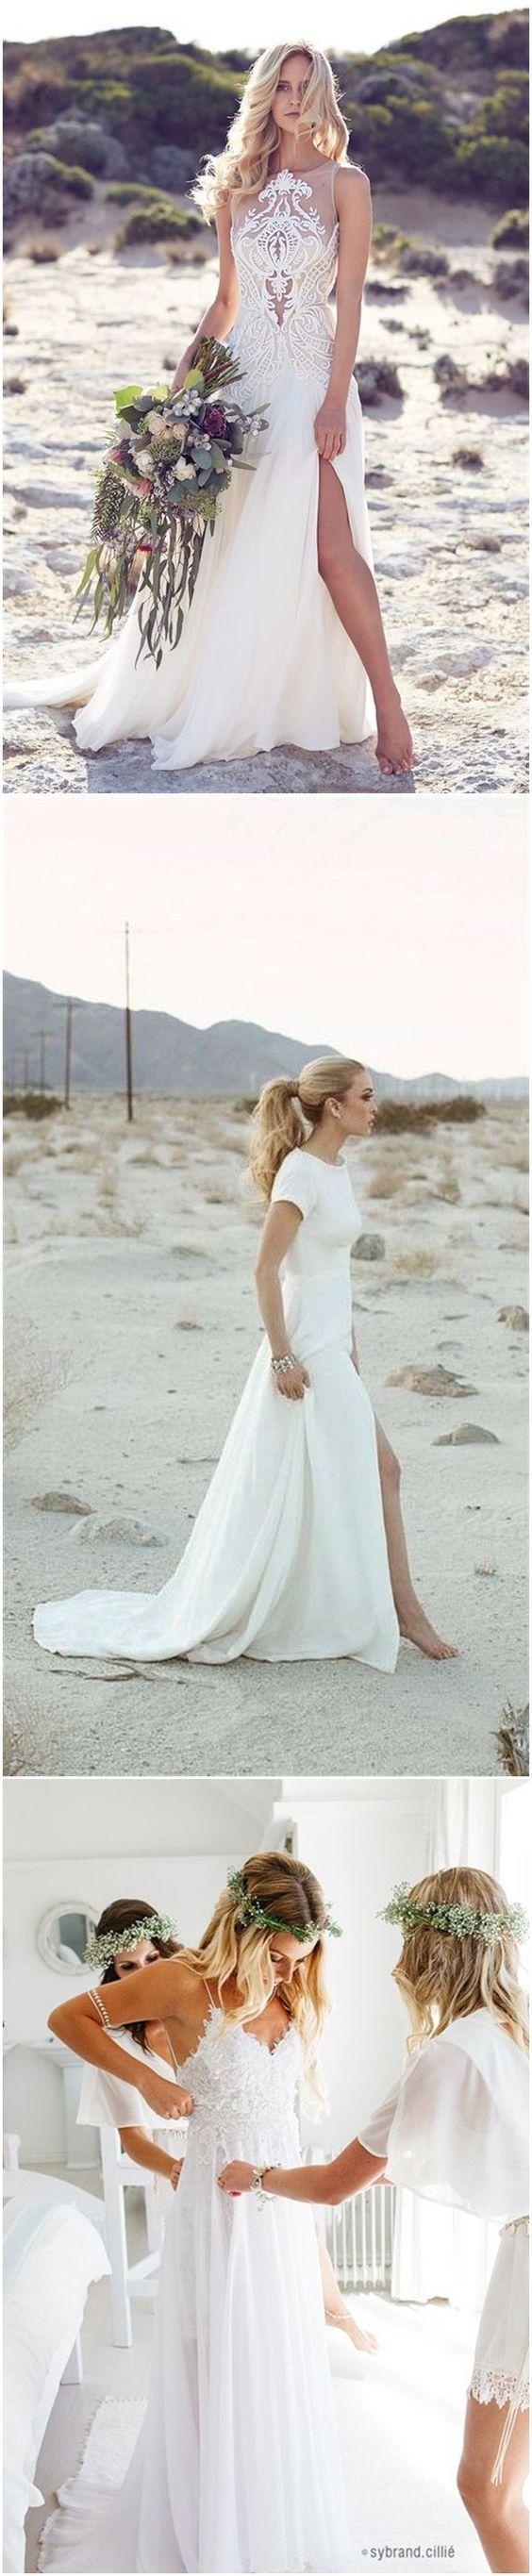 106 best Beach Wedding Ideas images on Pinterest | Beach weddings ...